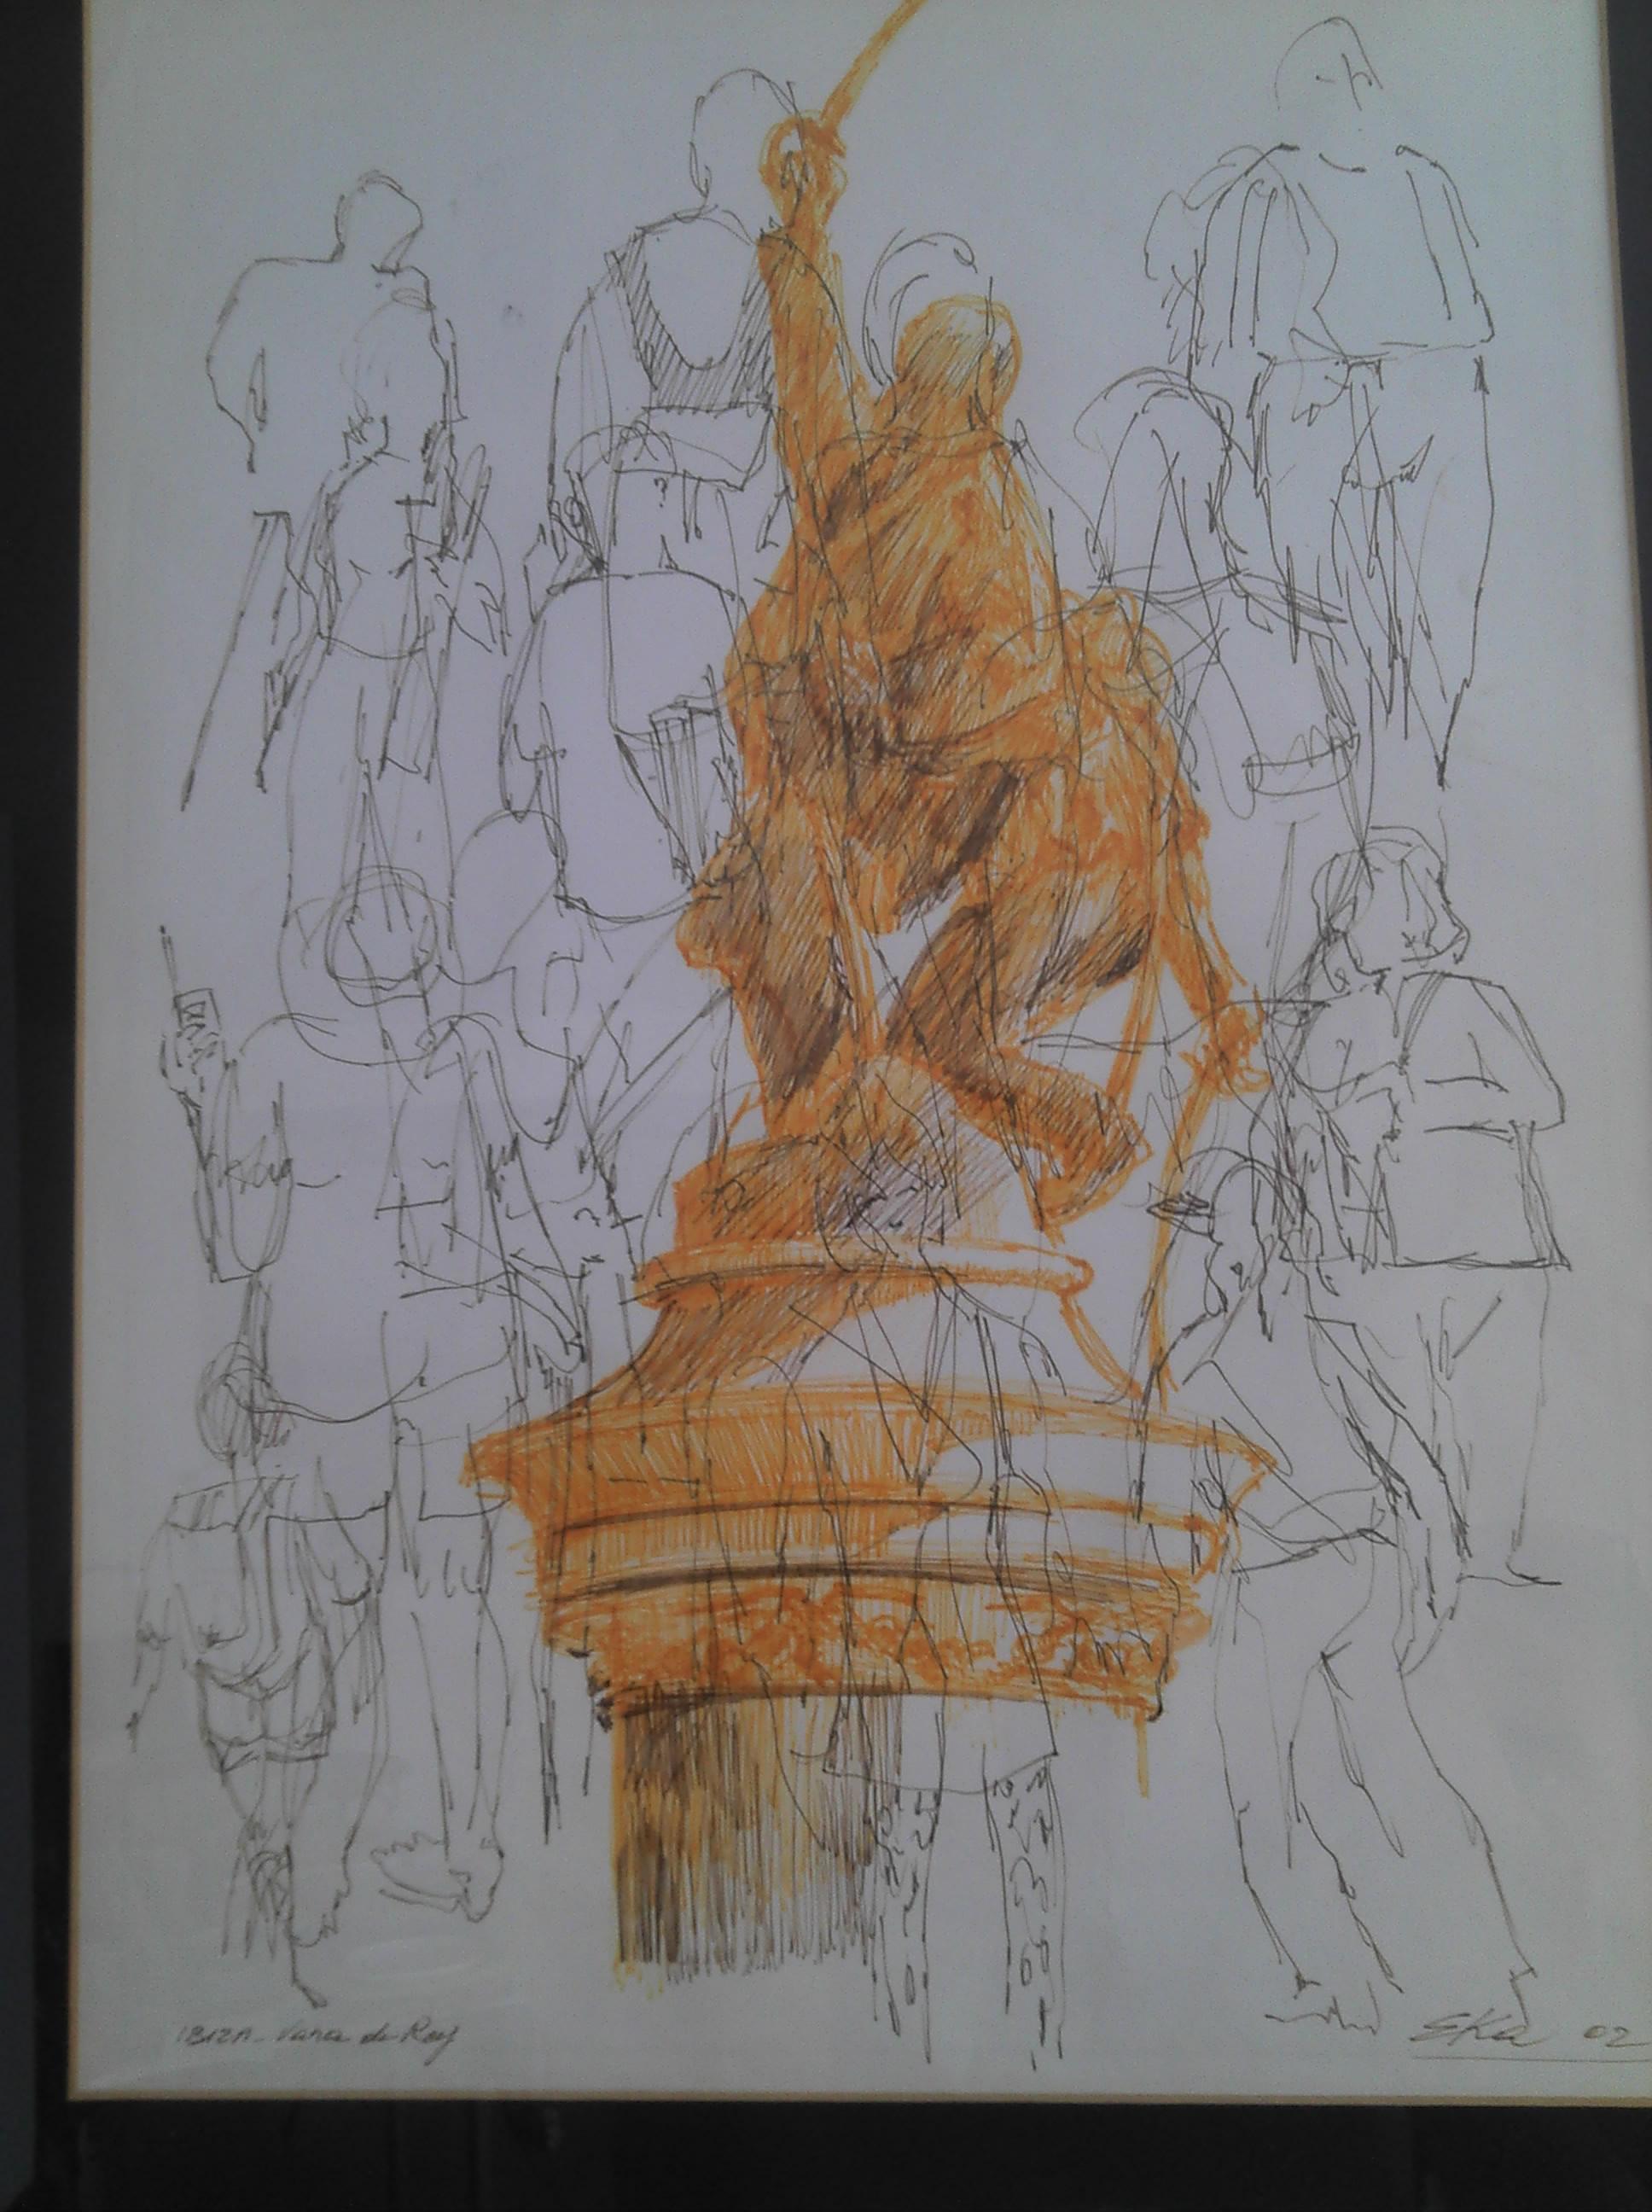 Dibujo de Eka, artista hippy y bohemio afincado en Formentera